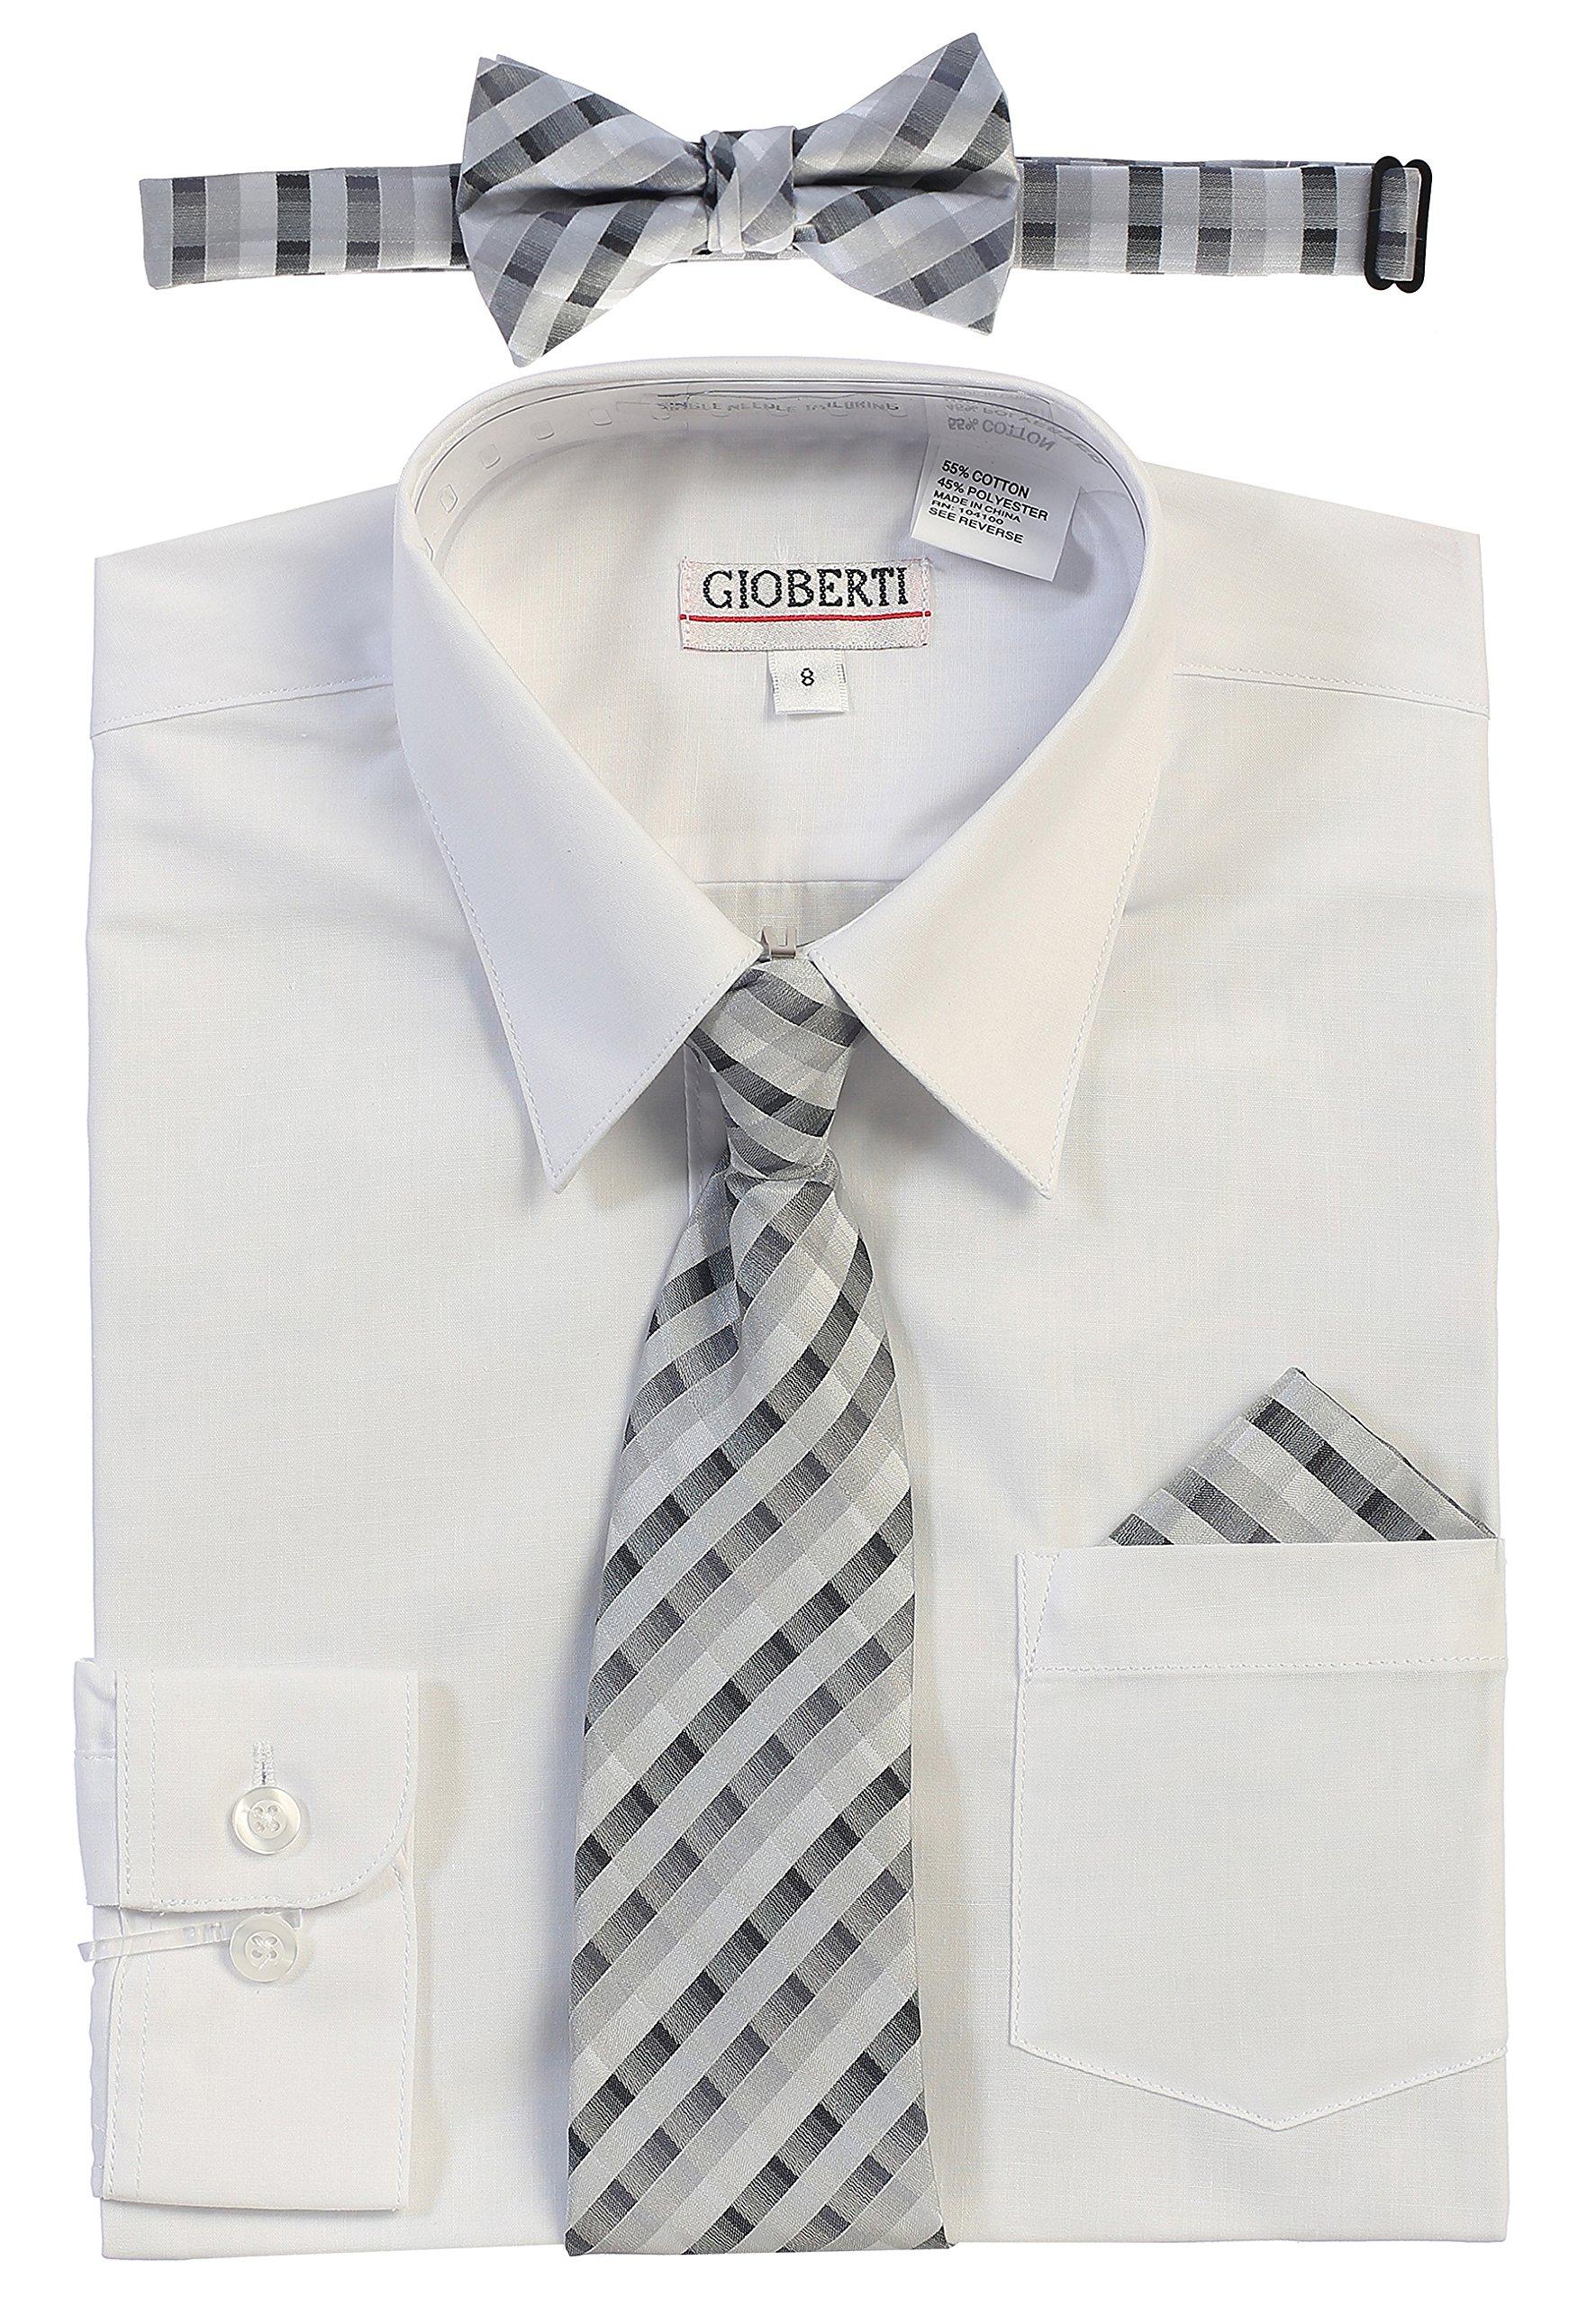 Gioberti Boy's Long Sleeve Dress Shirt and Tie Set, White, Size 7